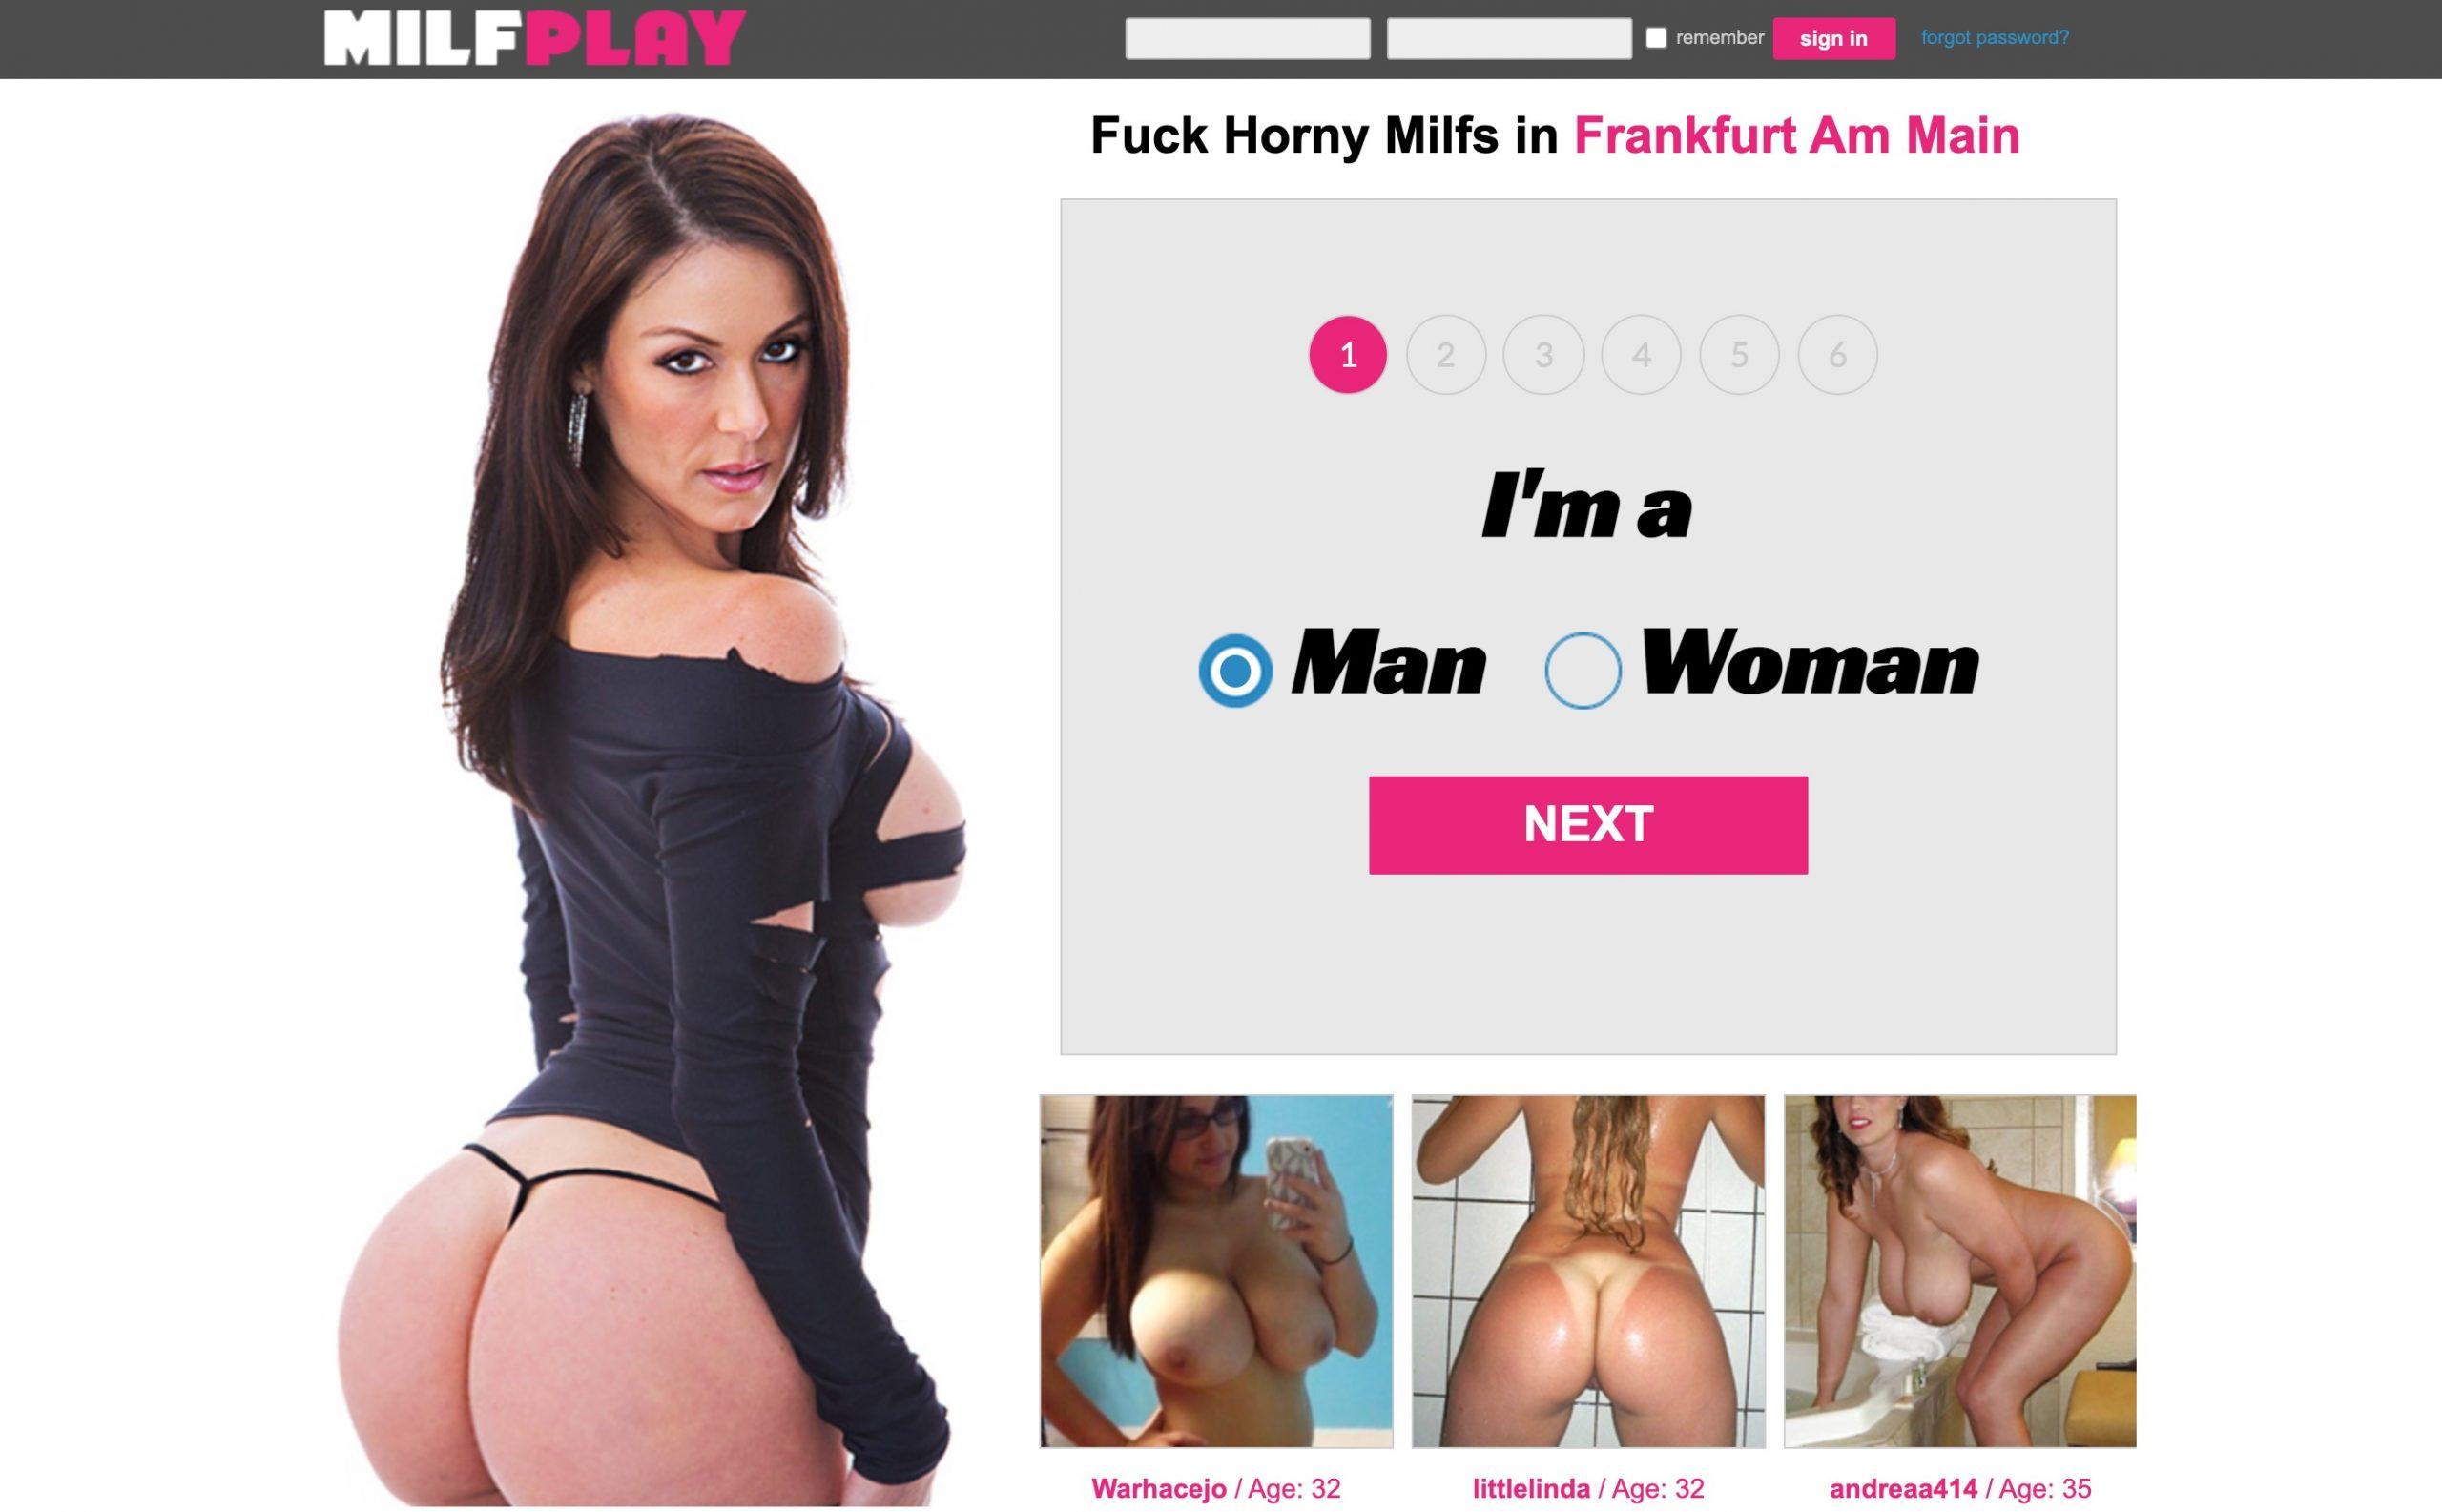 MILFplay main page